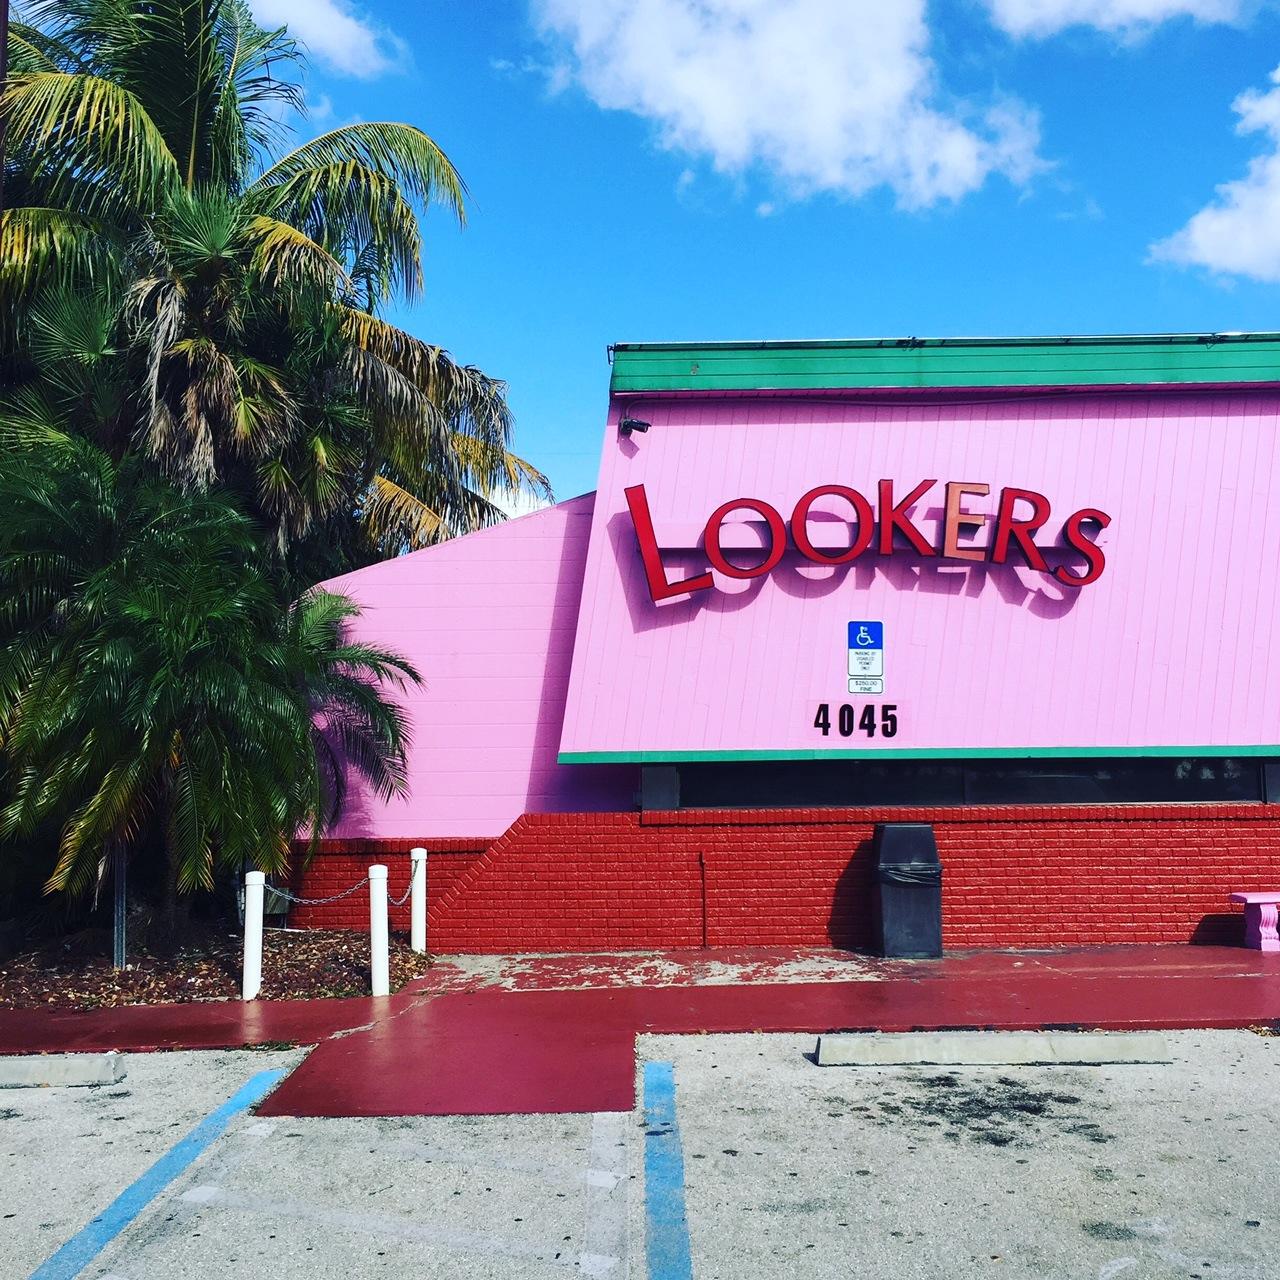 Lookers, Fort Meyers, FL / Photo credit: Susannah Breslin